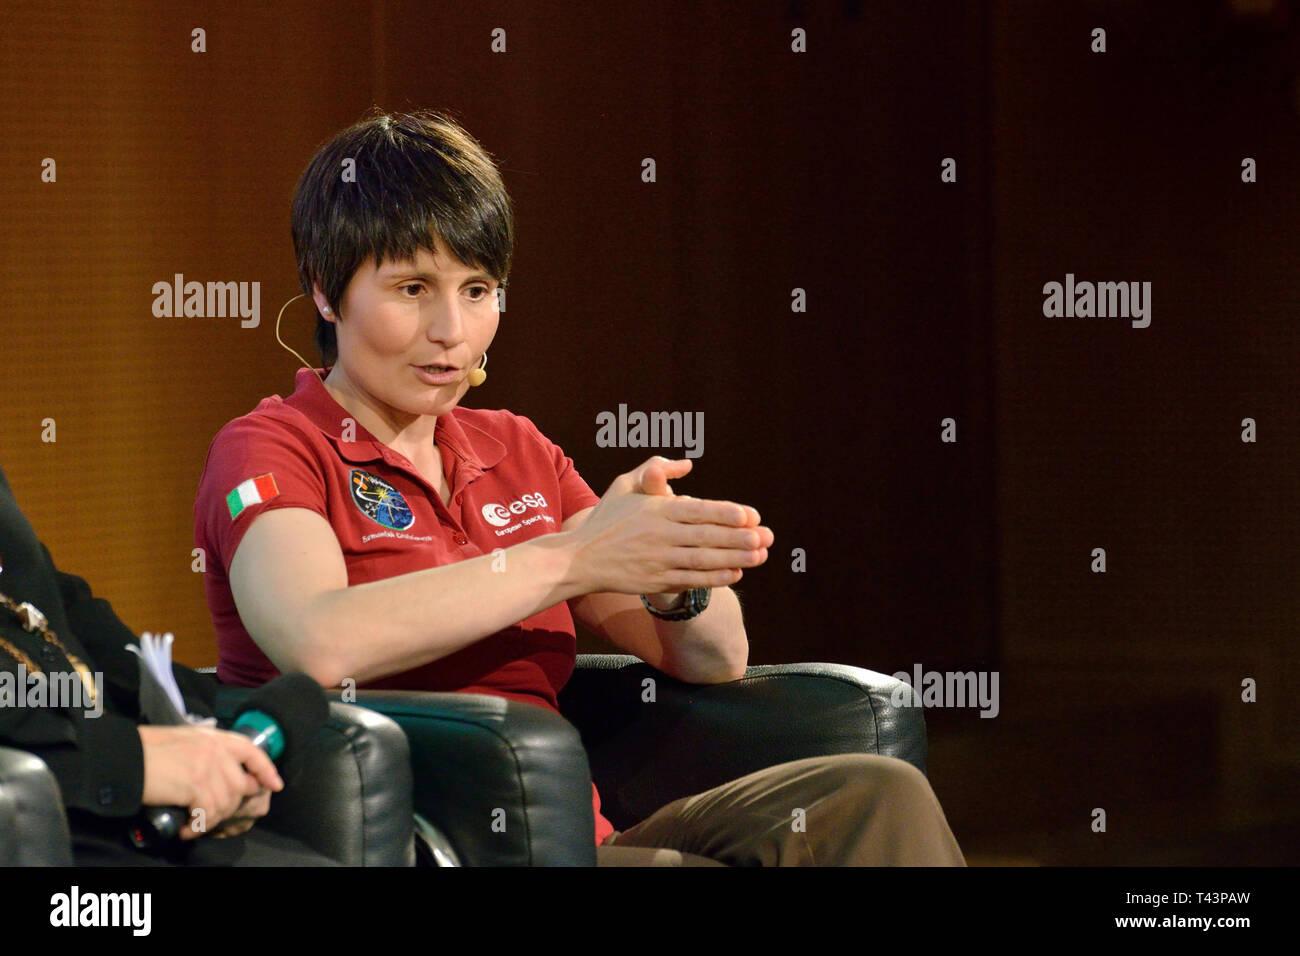 ESA Astronaut Samantha Cristoforetti - April 2019 - Stock Image